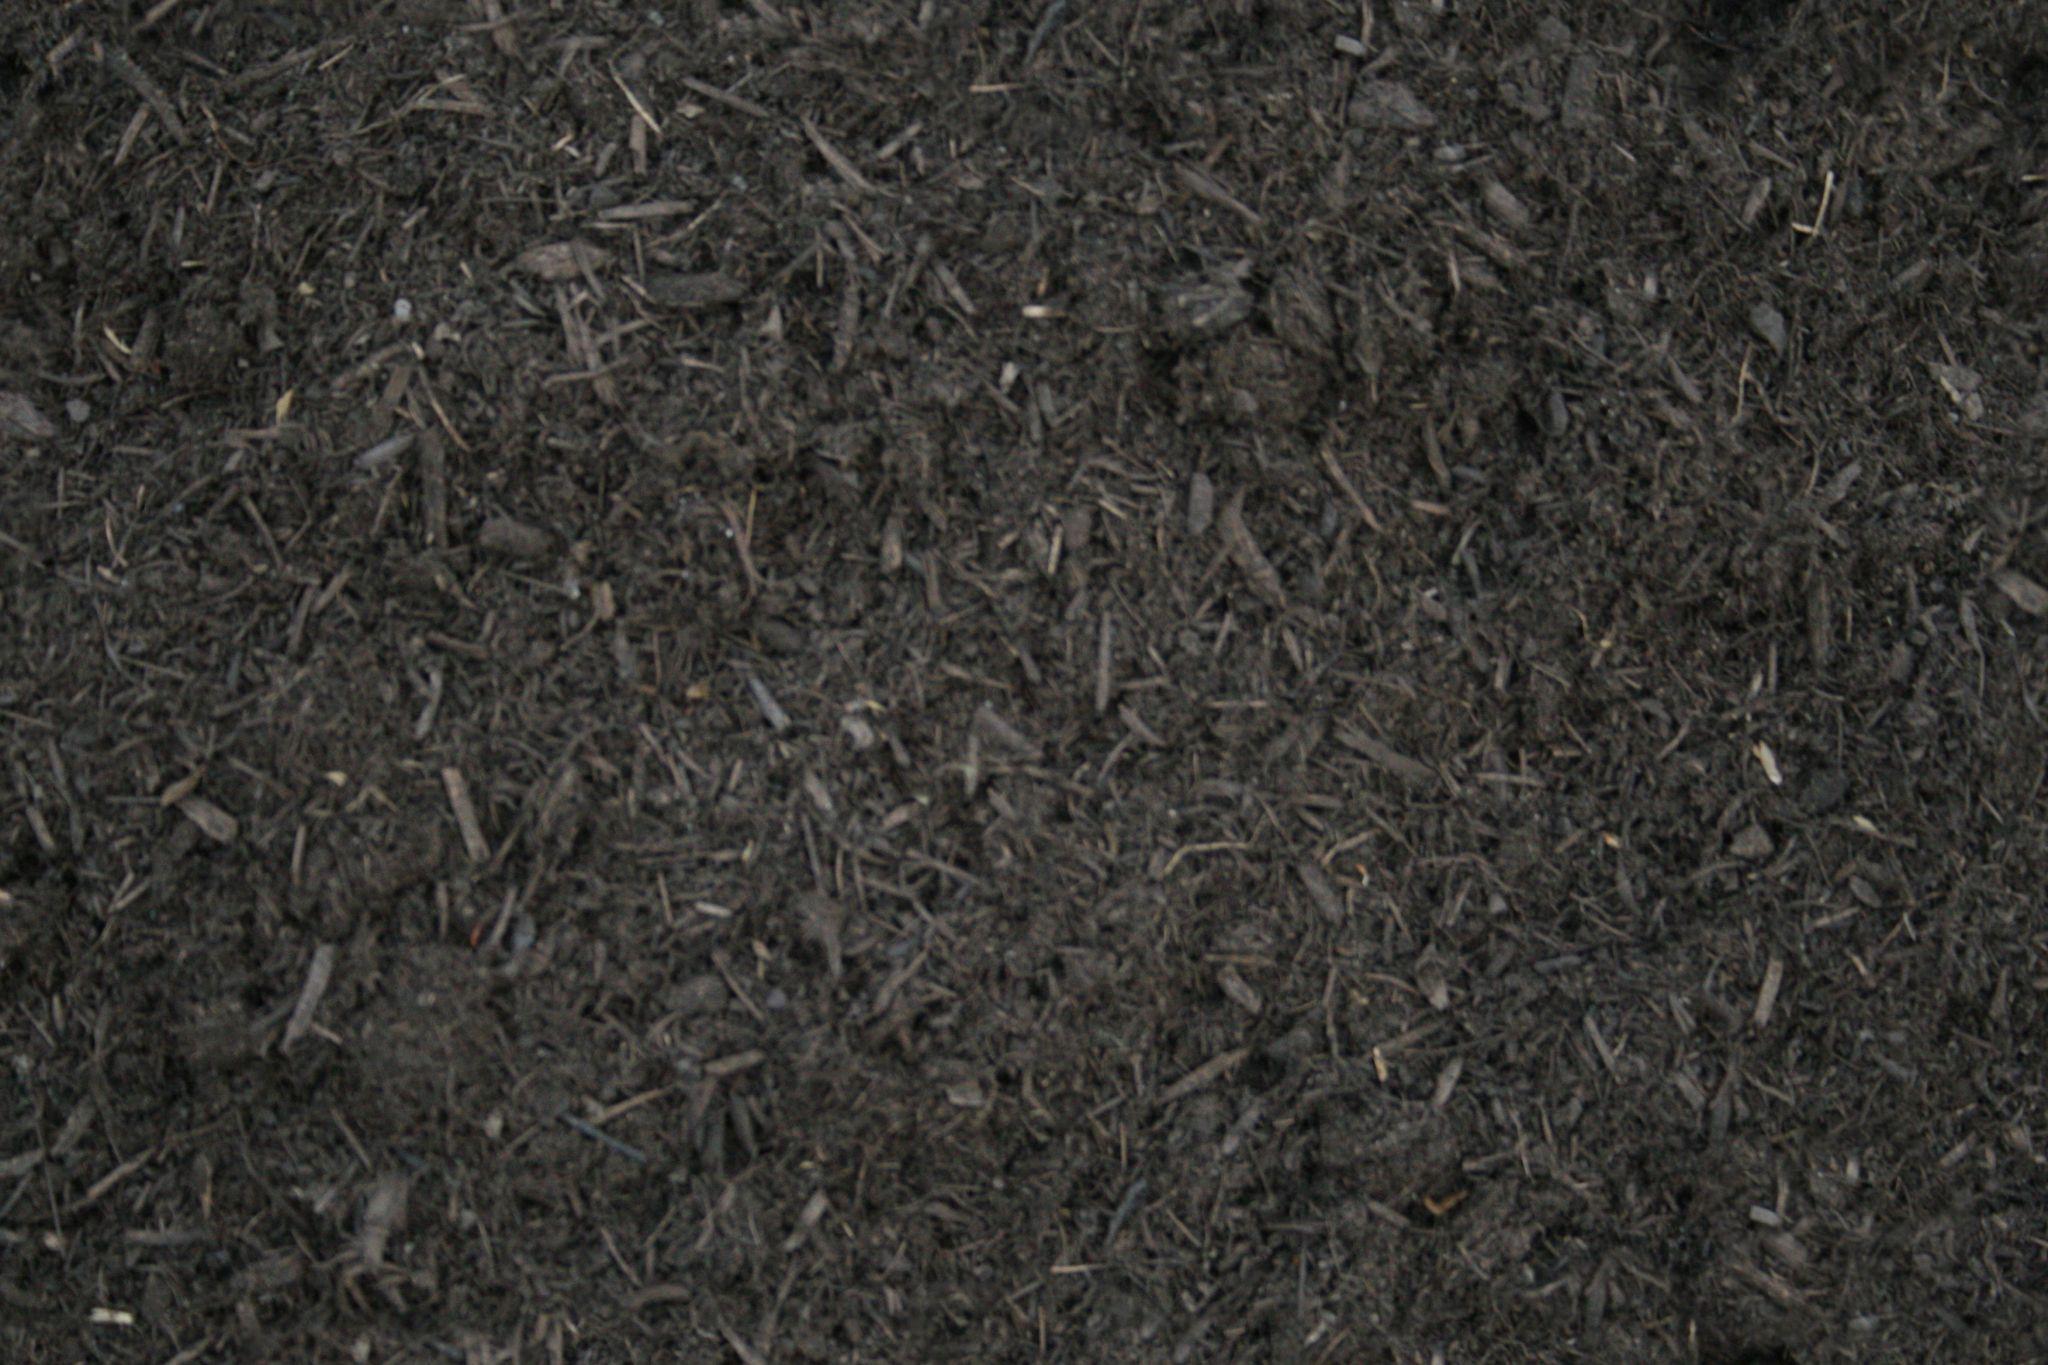 Free Photo Dirt Texture Brown Dirt Earth Free